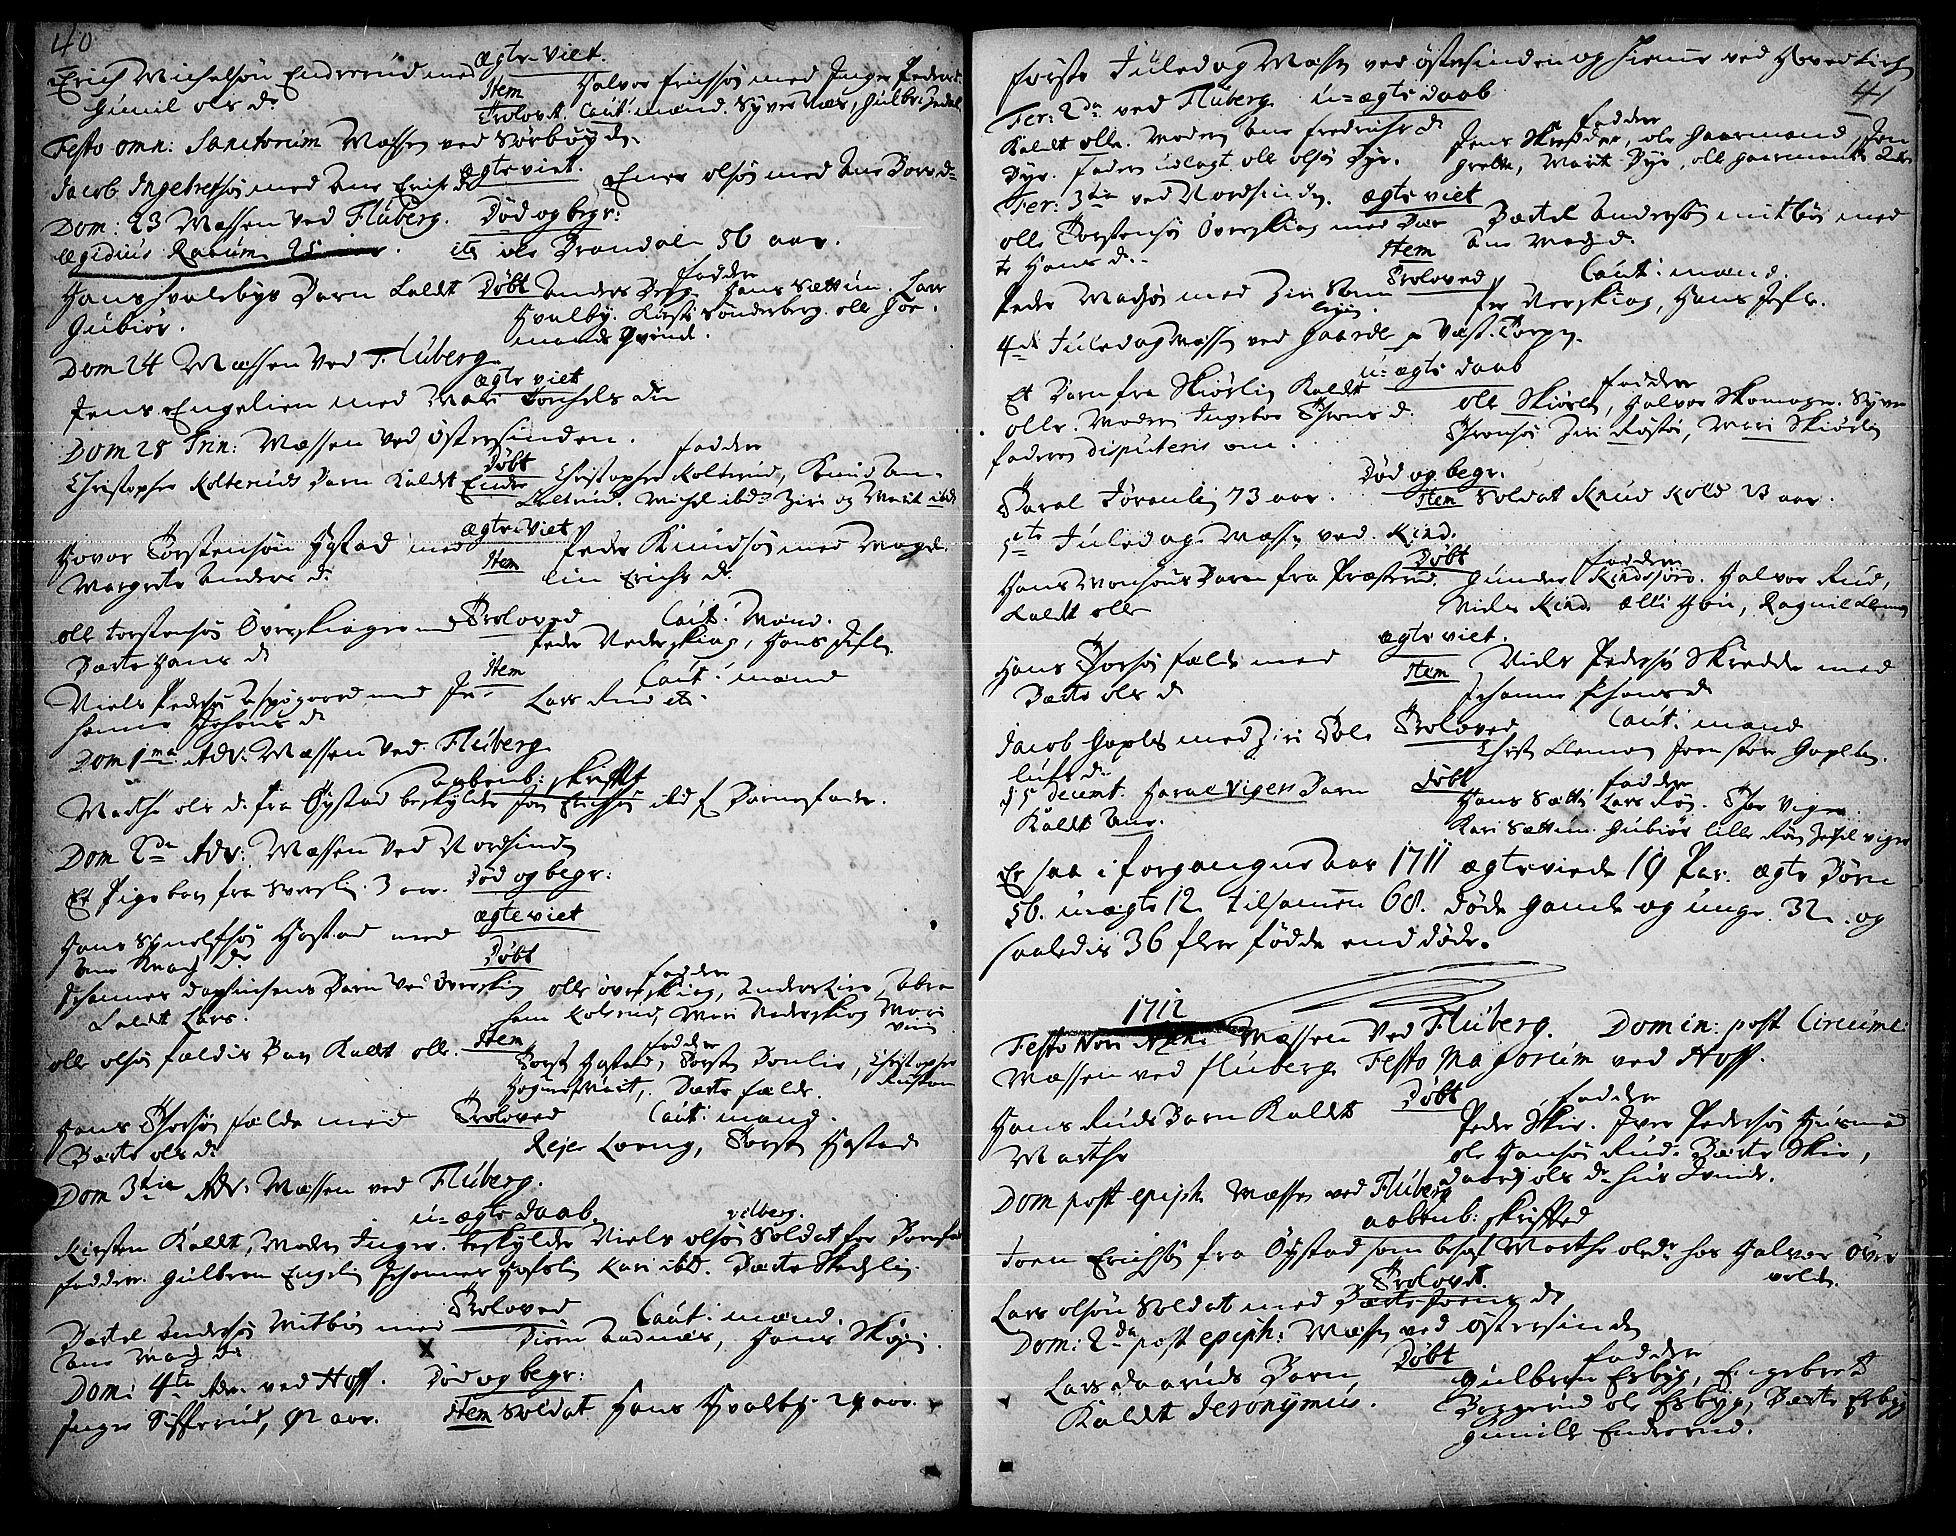 SAH, Land prestekontor, Ministerialbok nr. 1, 1708-1732, s. 40-41